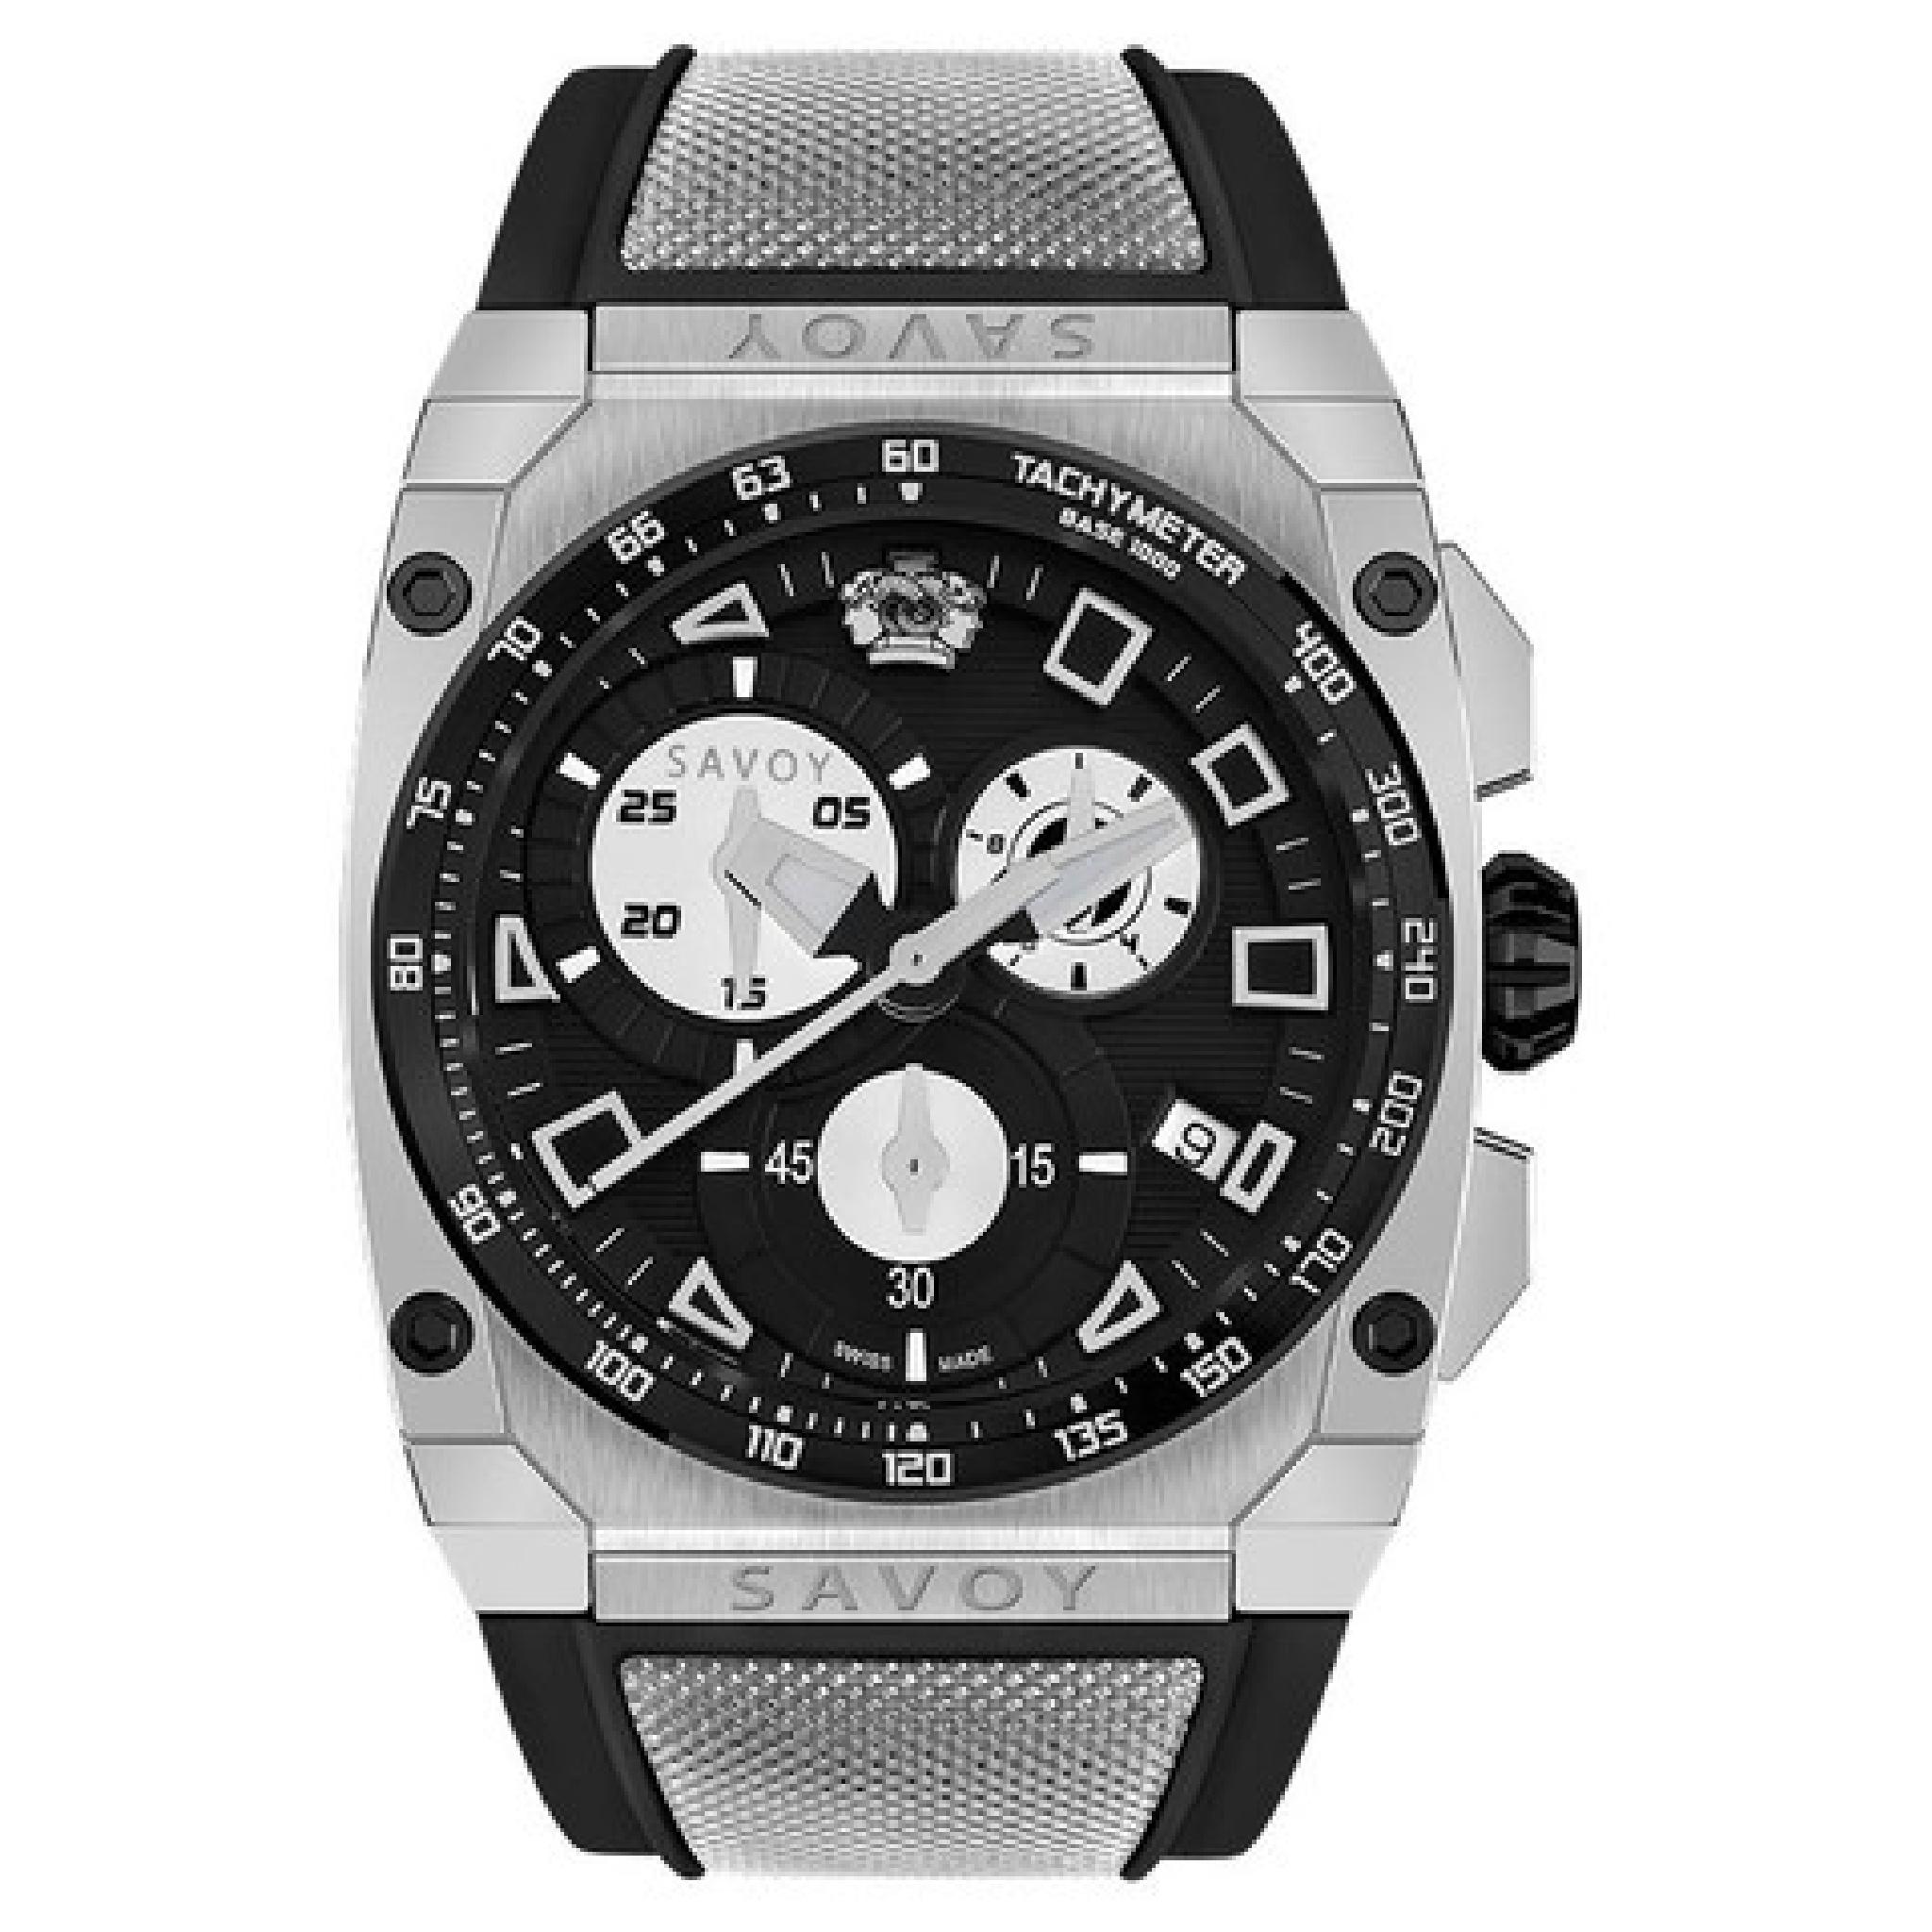 Luxury Watches - Savoy Extreme Chronograph Wrist Watch by husen12